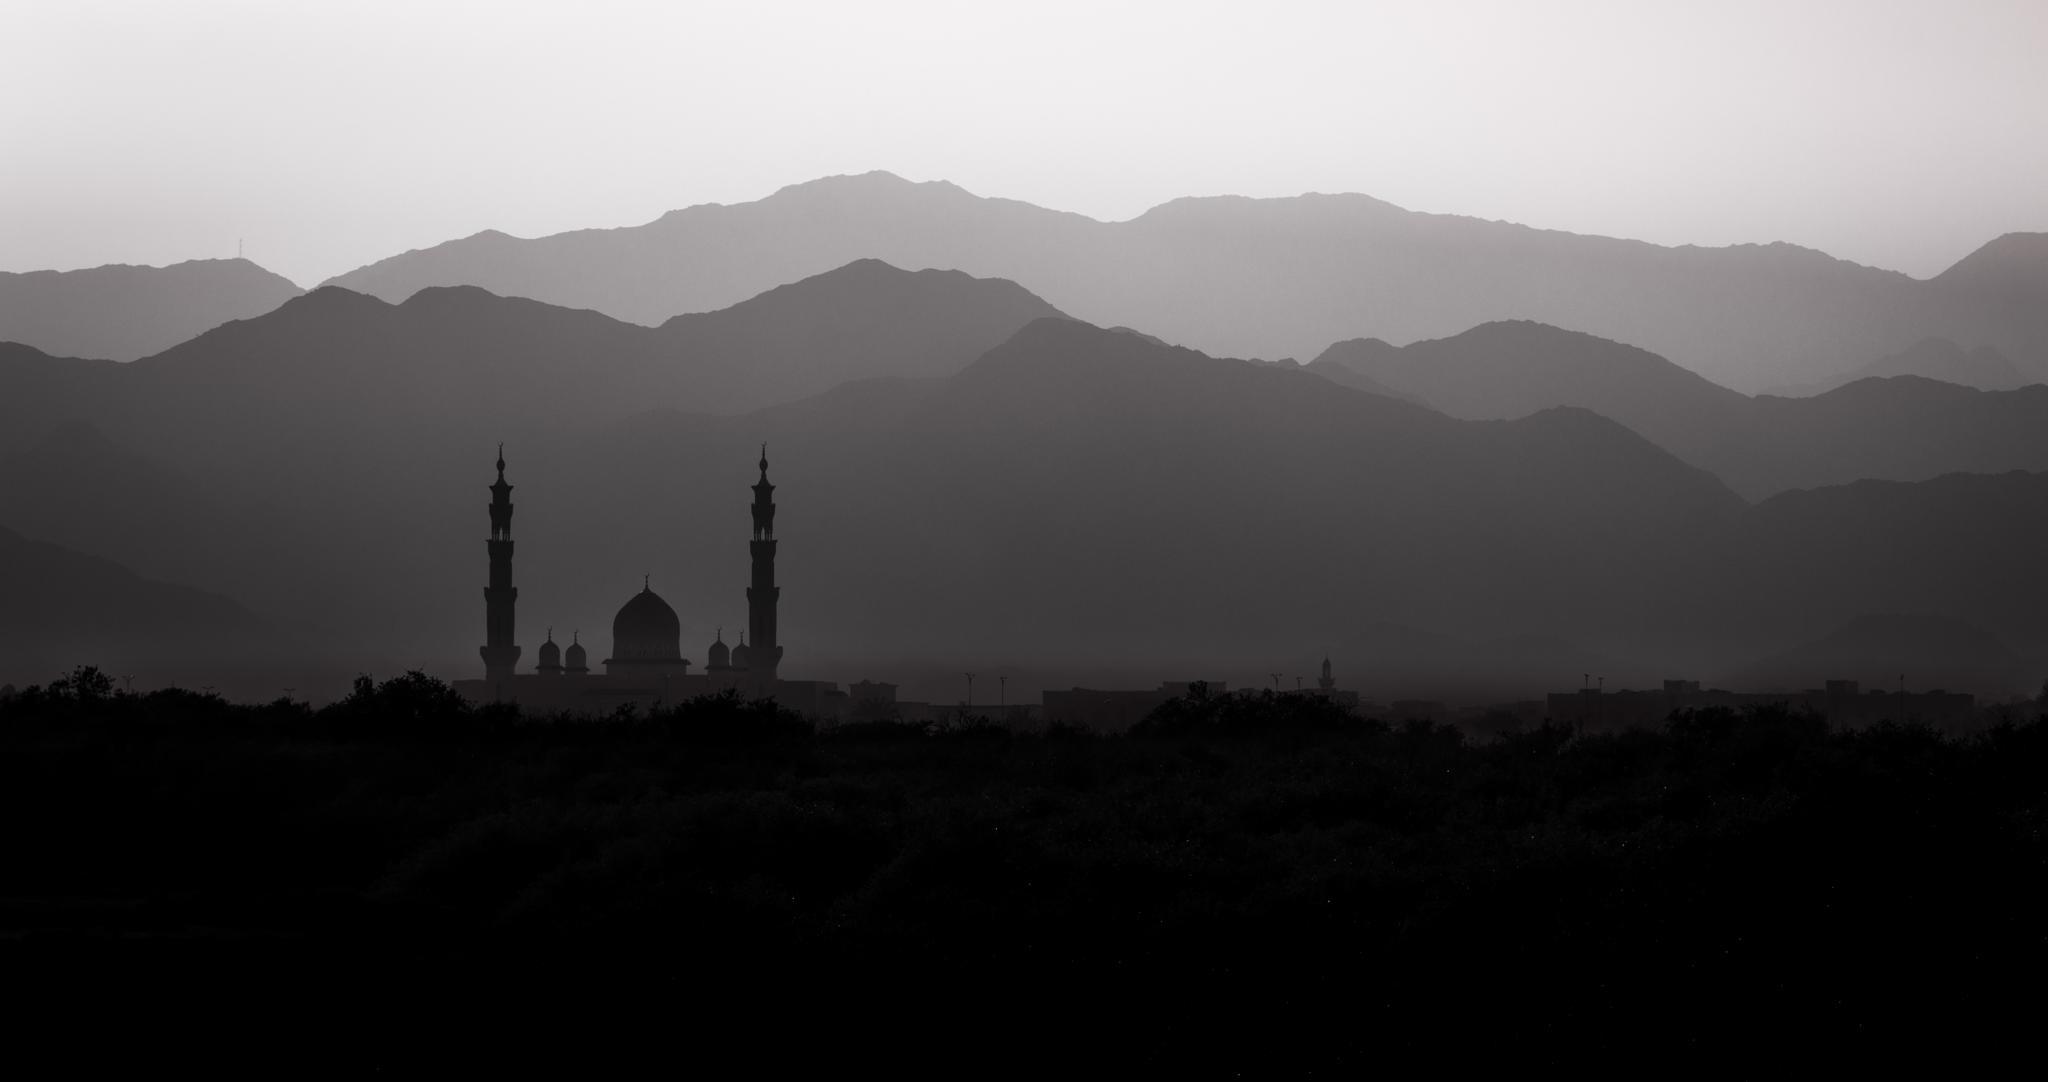 The Eternal Light 2 by ShaheenUmmalil